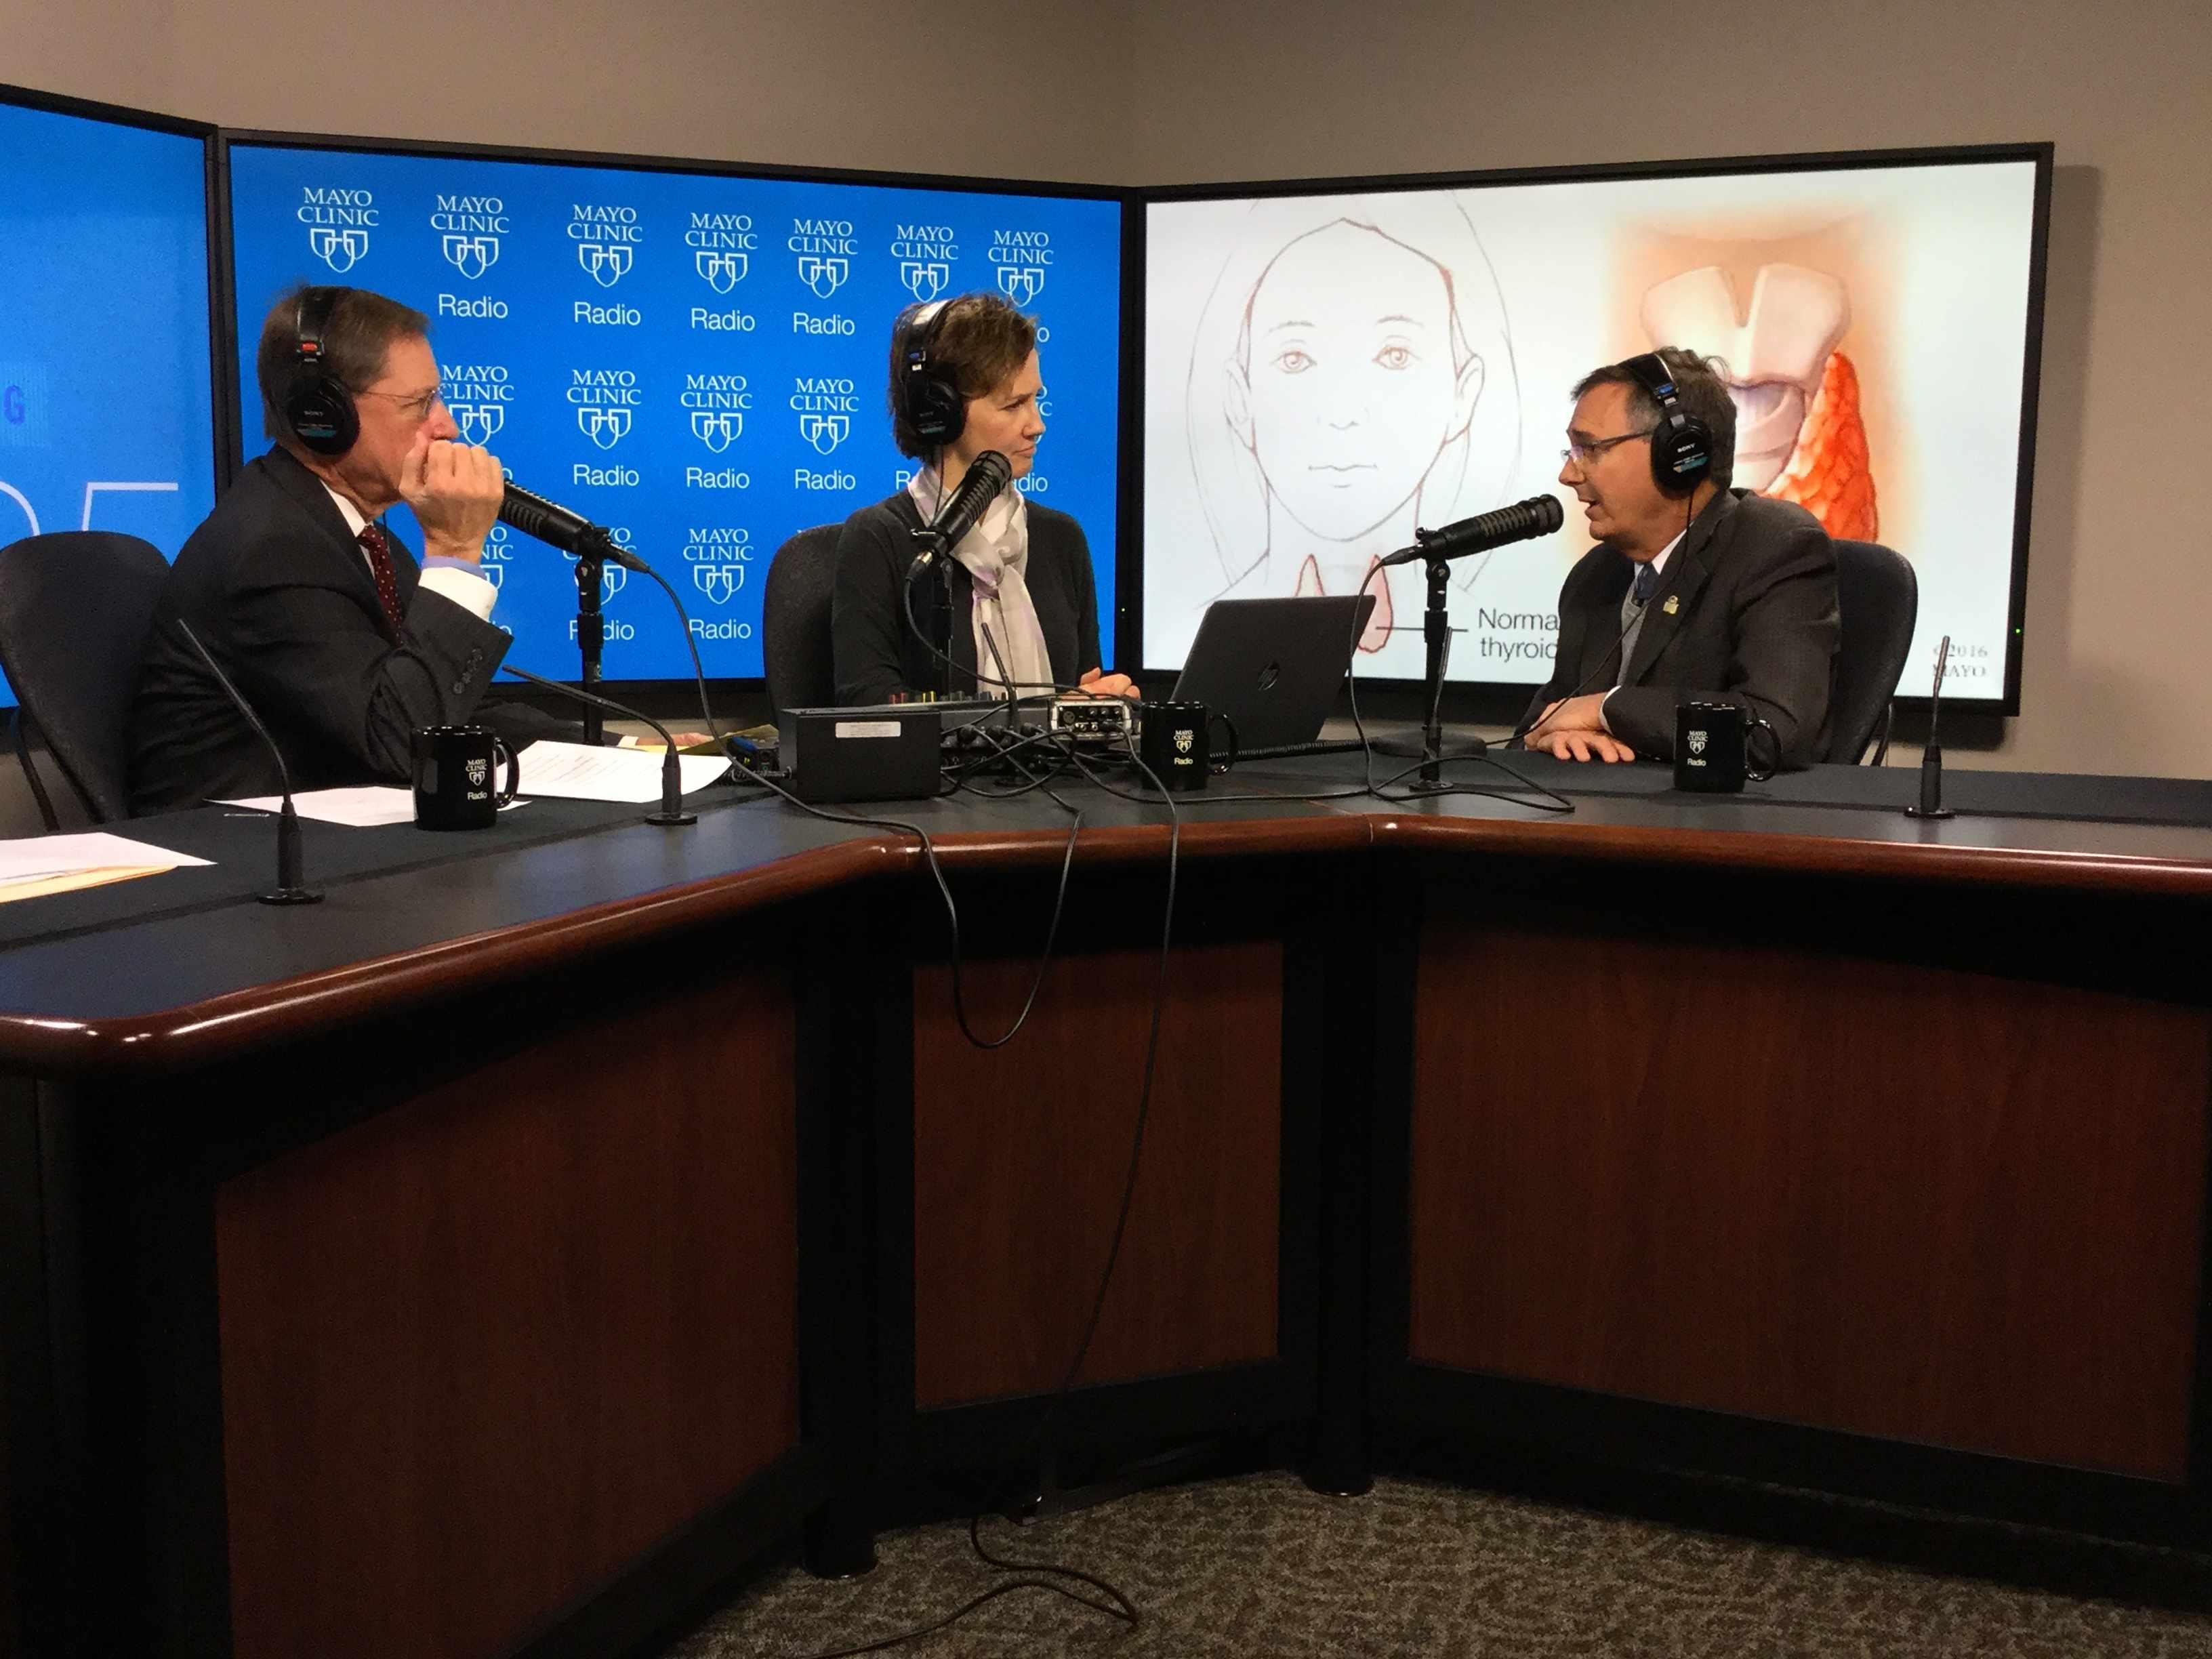 Dr. John C. Morris being interviewed on Mayo Clinic Radio